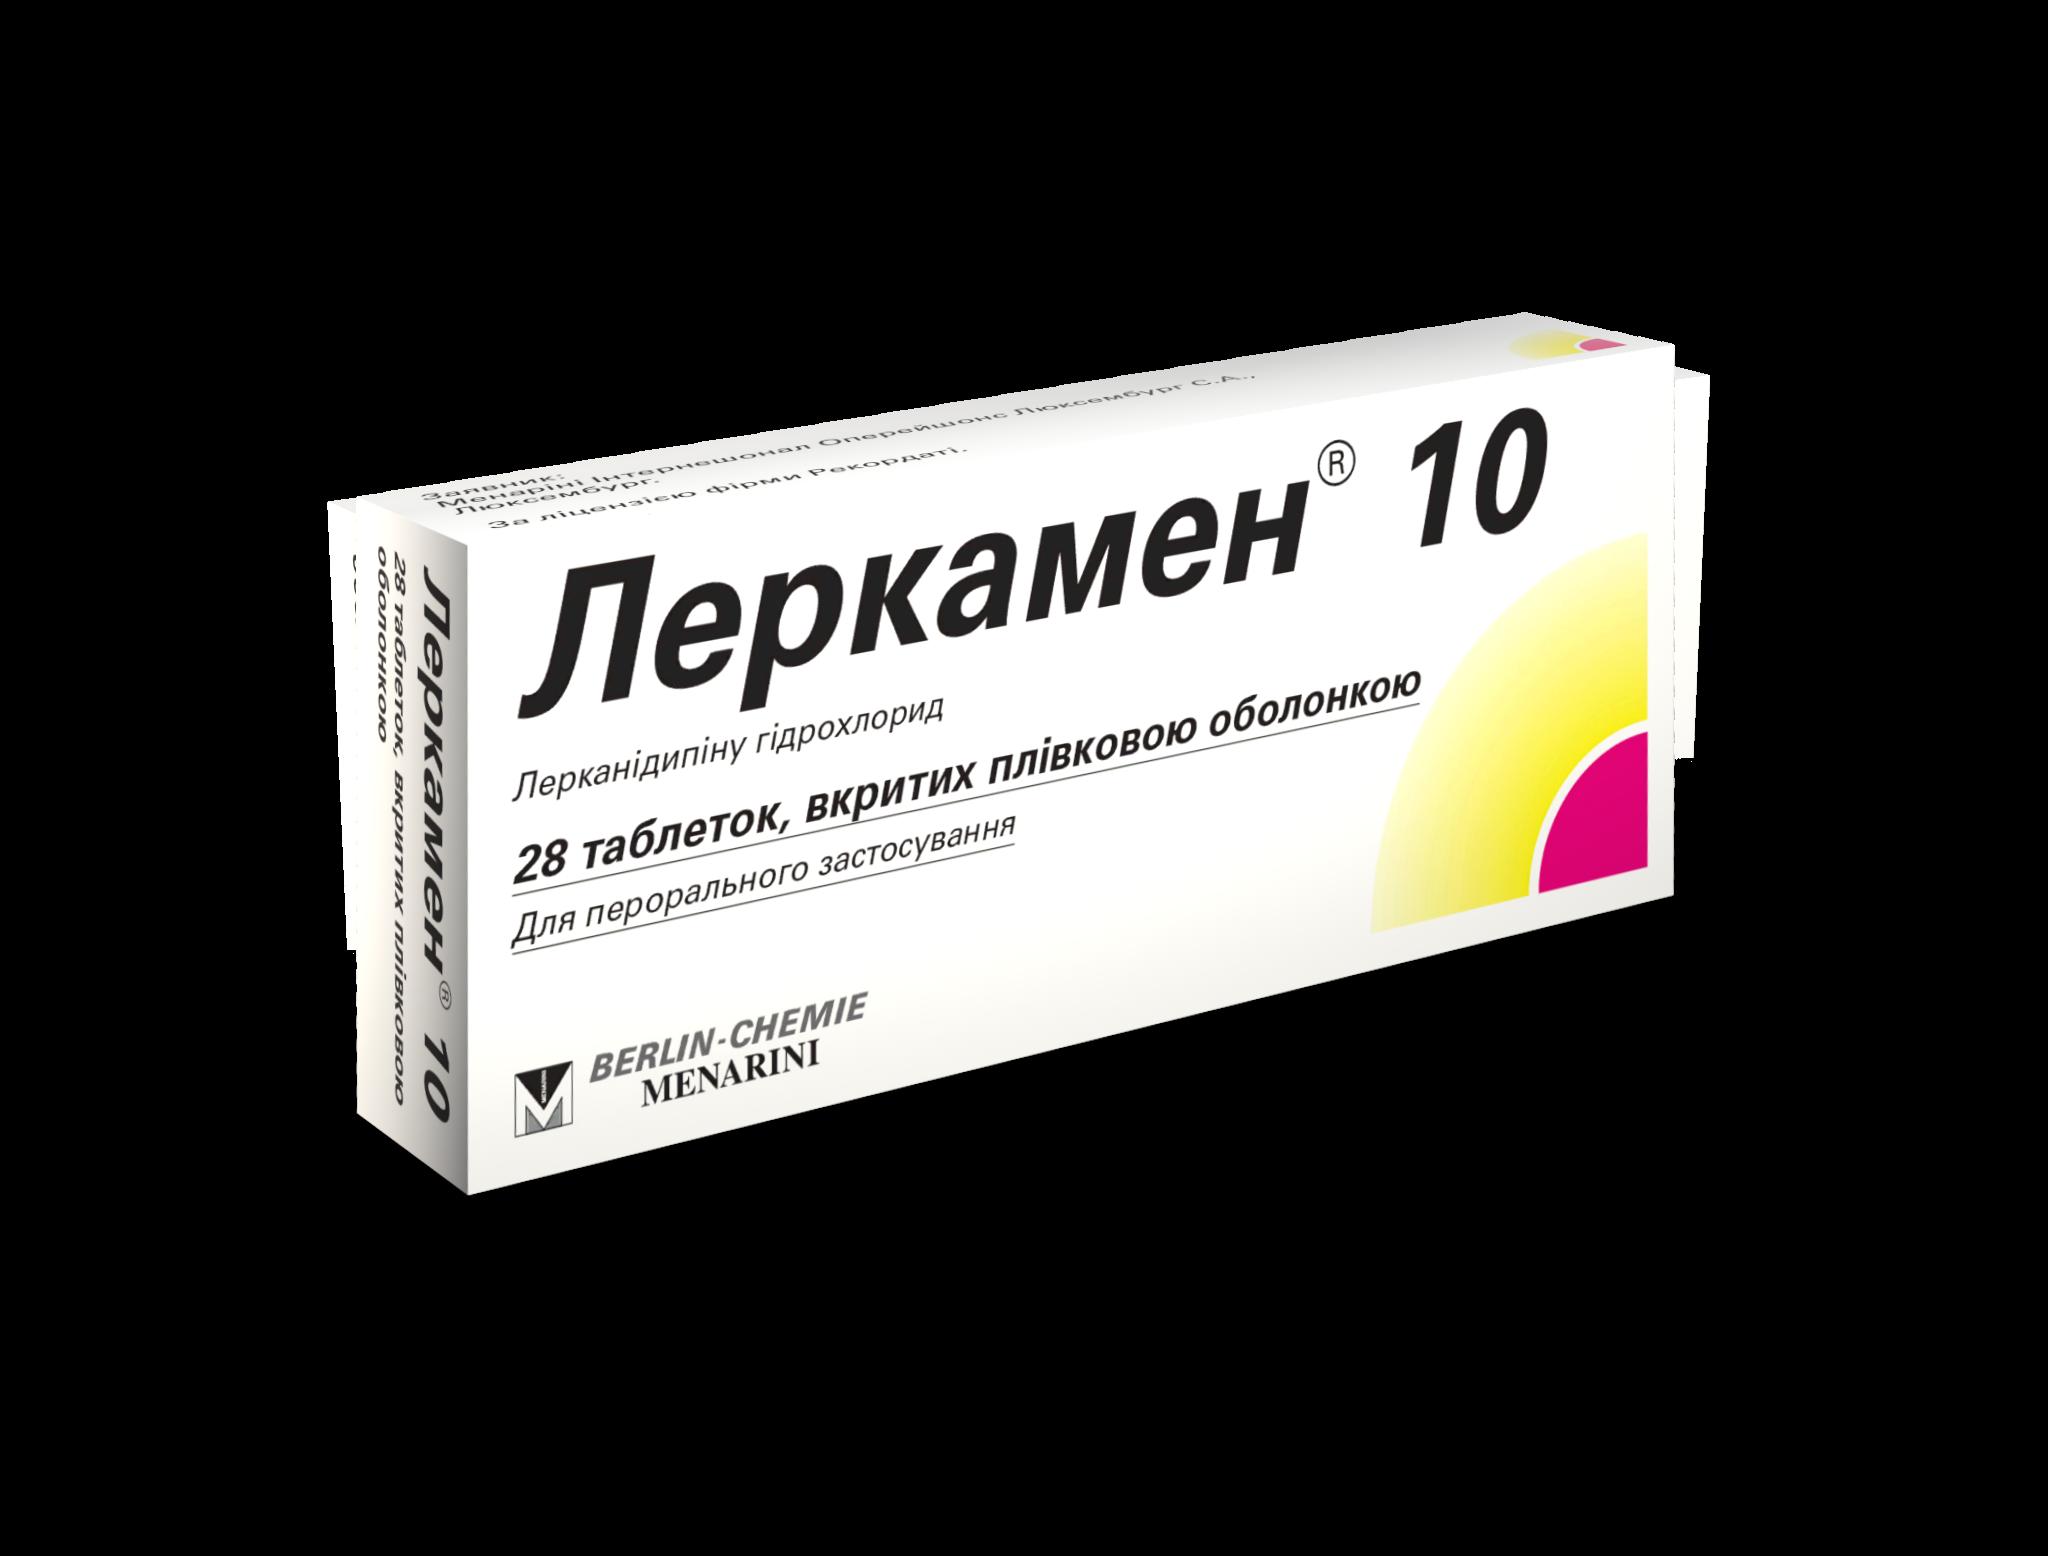 Леркамен 10 мг №28 таблетки_6006126611597.png